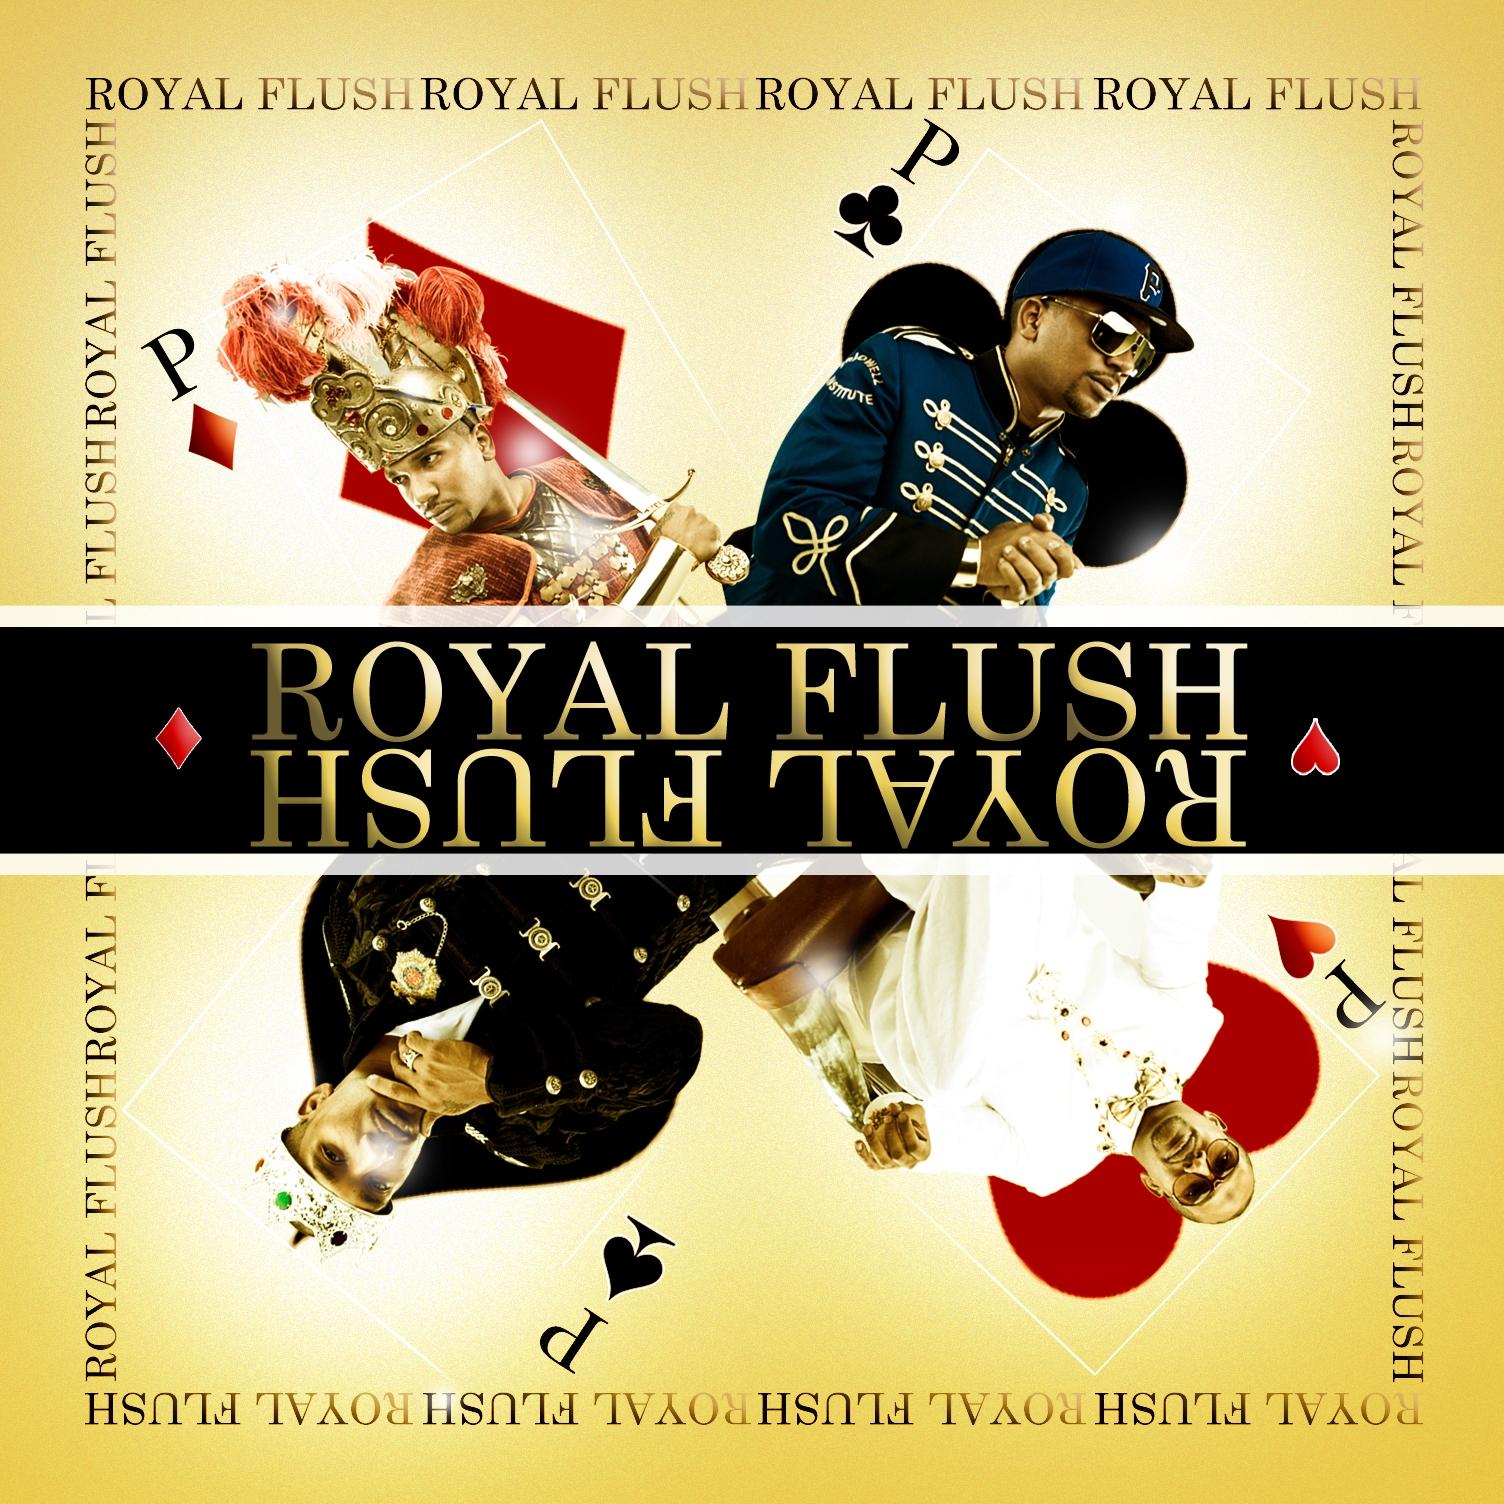 CyHi Da Prynce - Royal Flush (Mixtape) - Nah Right | Nah Right